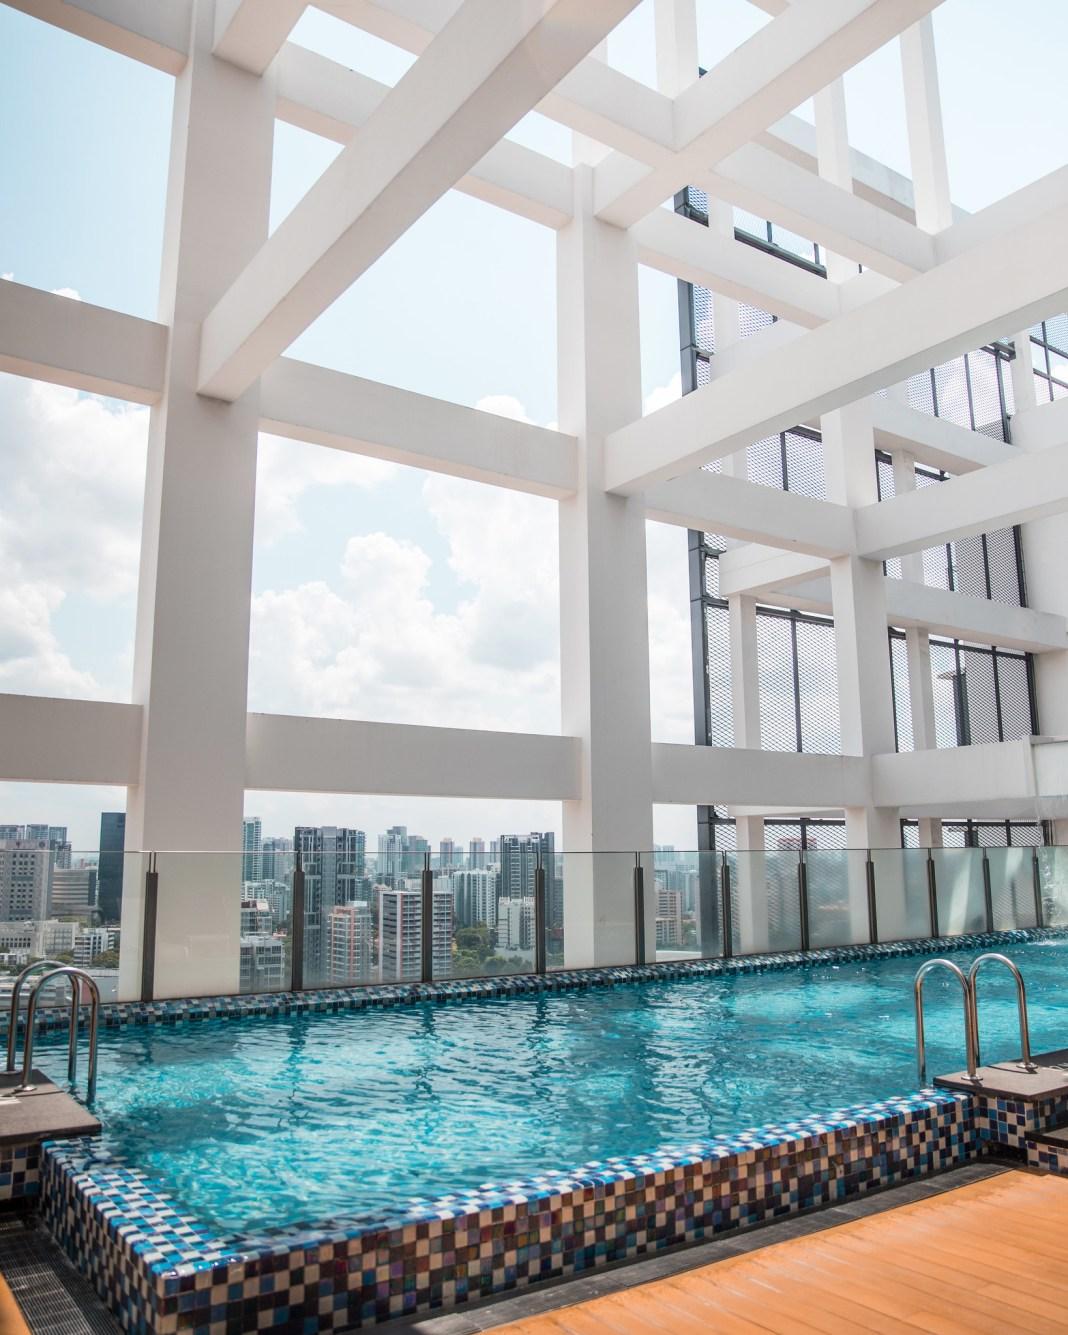 One Farrer Hotel Singapore - Hotel in Singapore, Singapore Travel, Singapore Travel Tips, Singapore Hotels, Best Hotels in Singapore, Luxury Hotel Singapore   Wanderlustyle.com